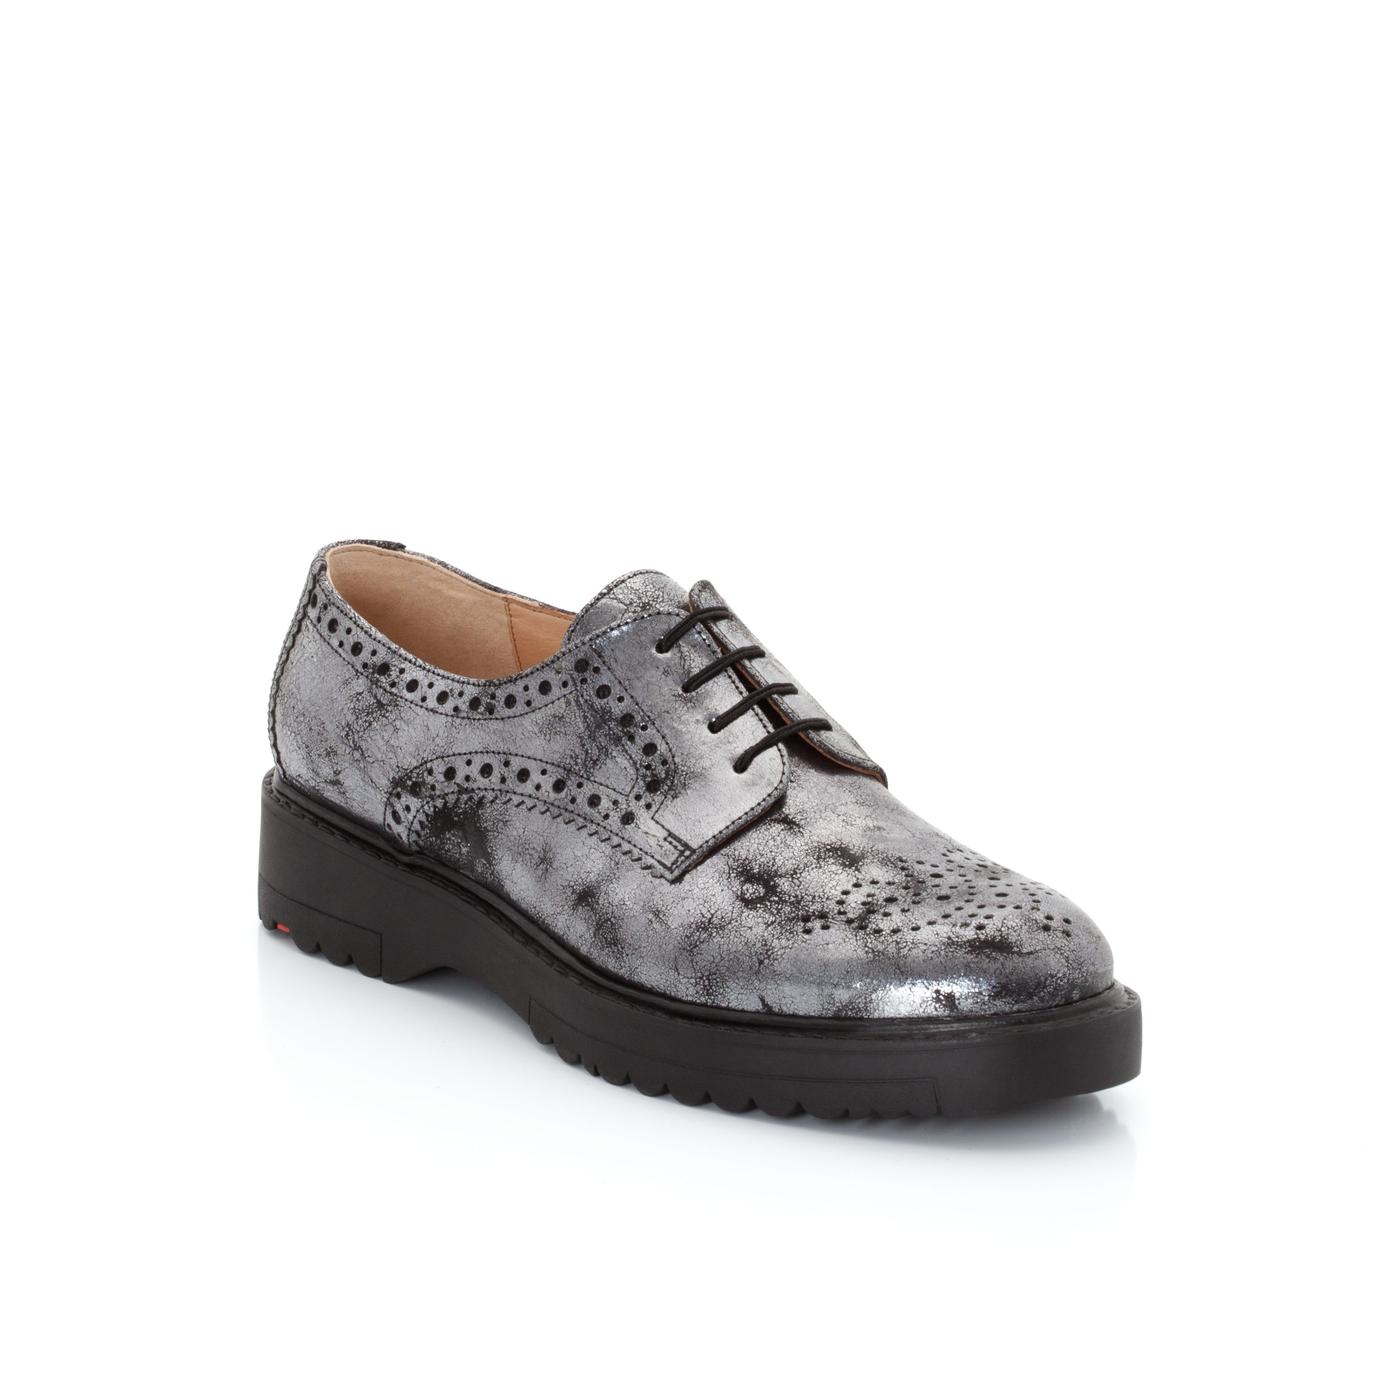 Halbschuhe | Schuhe > Boots > Schnürboots | Silber | Effektleder -  leder | LLOYD